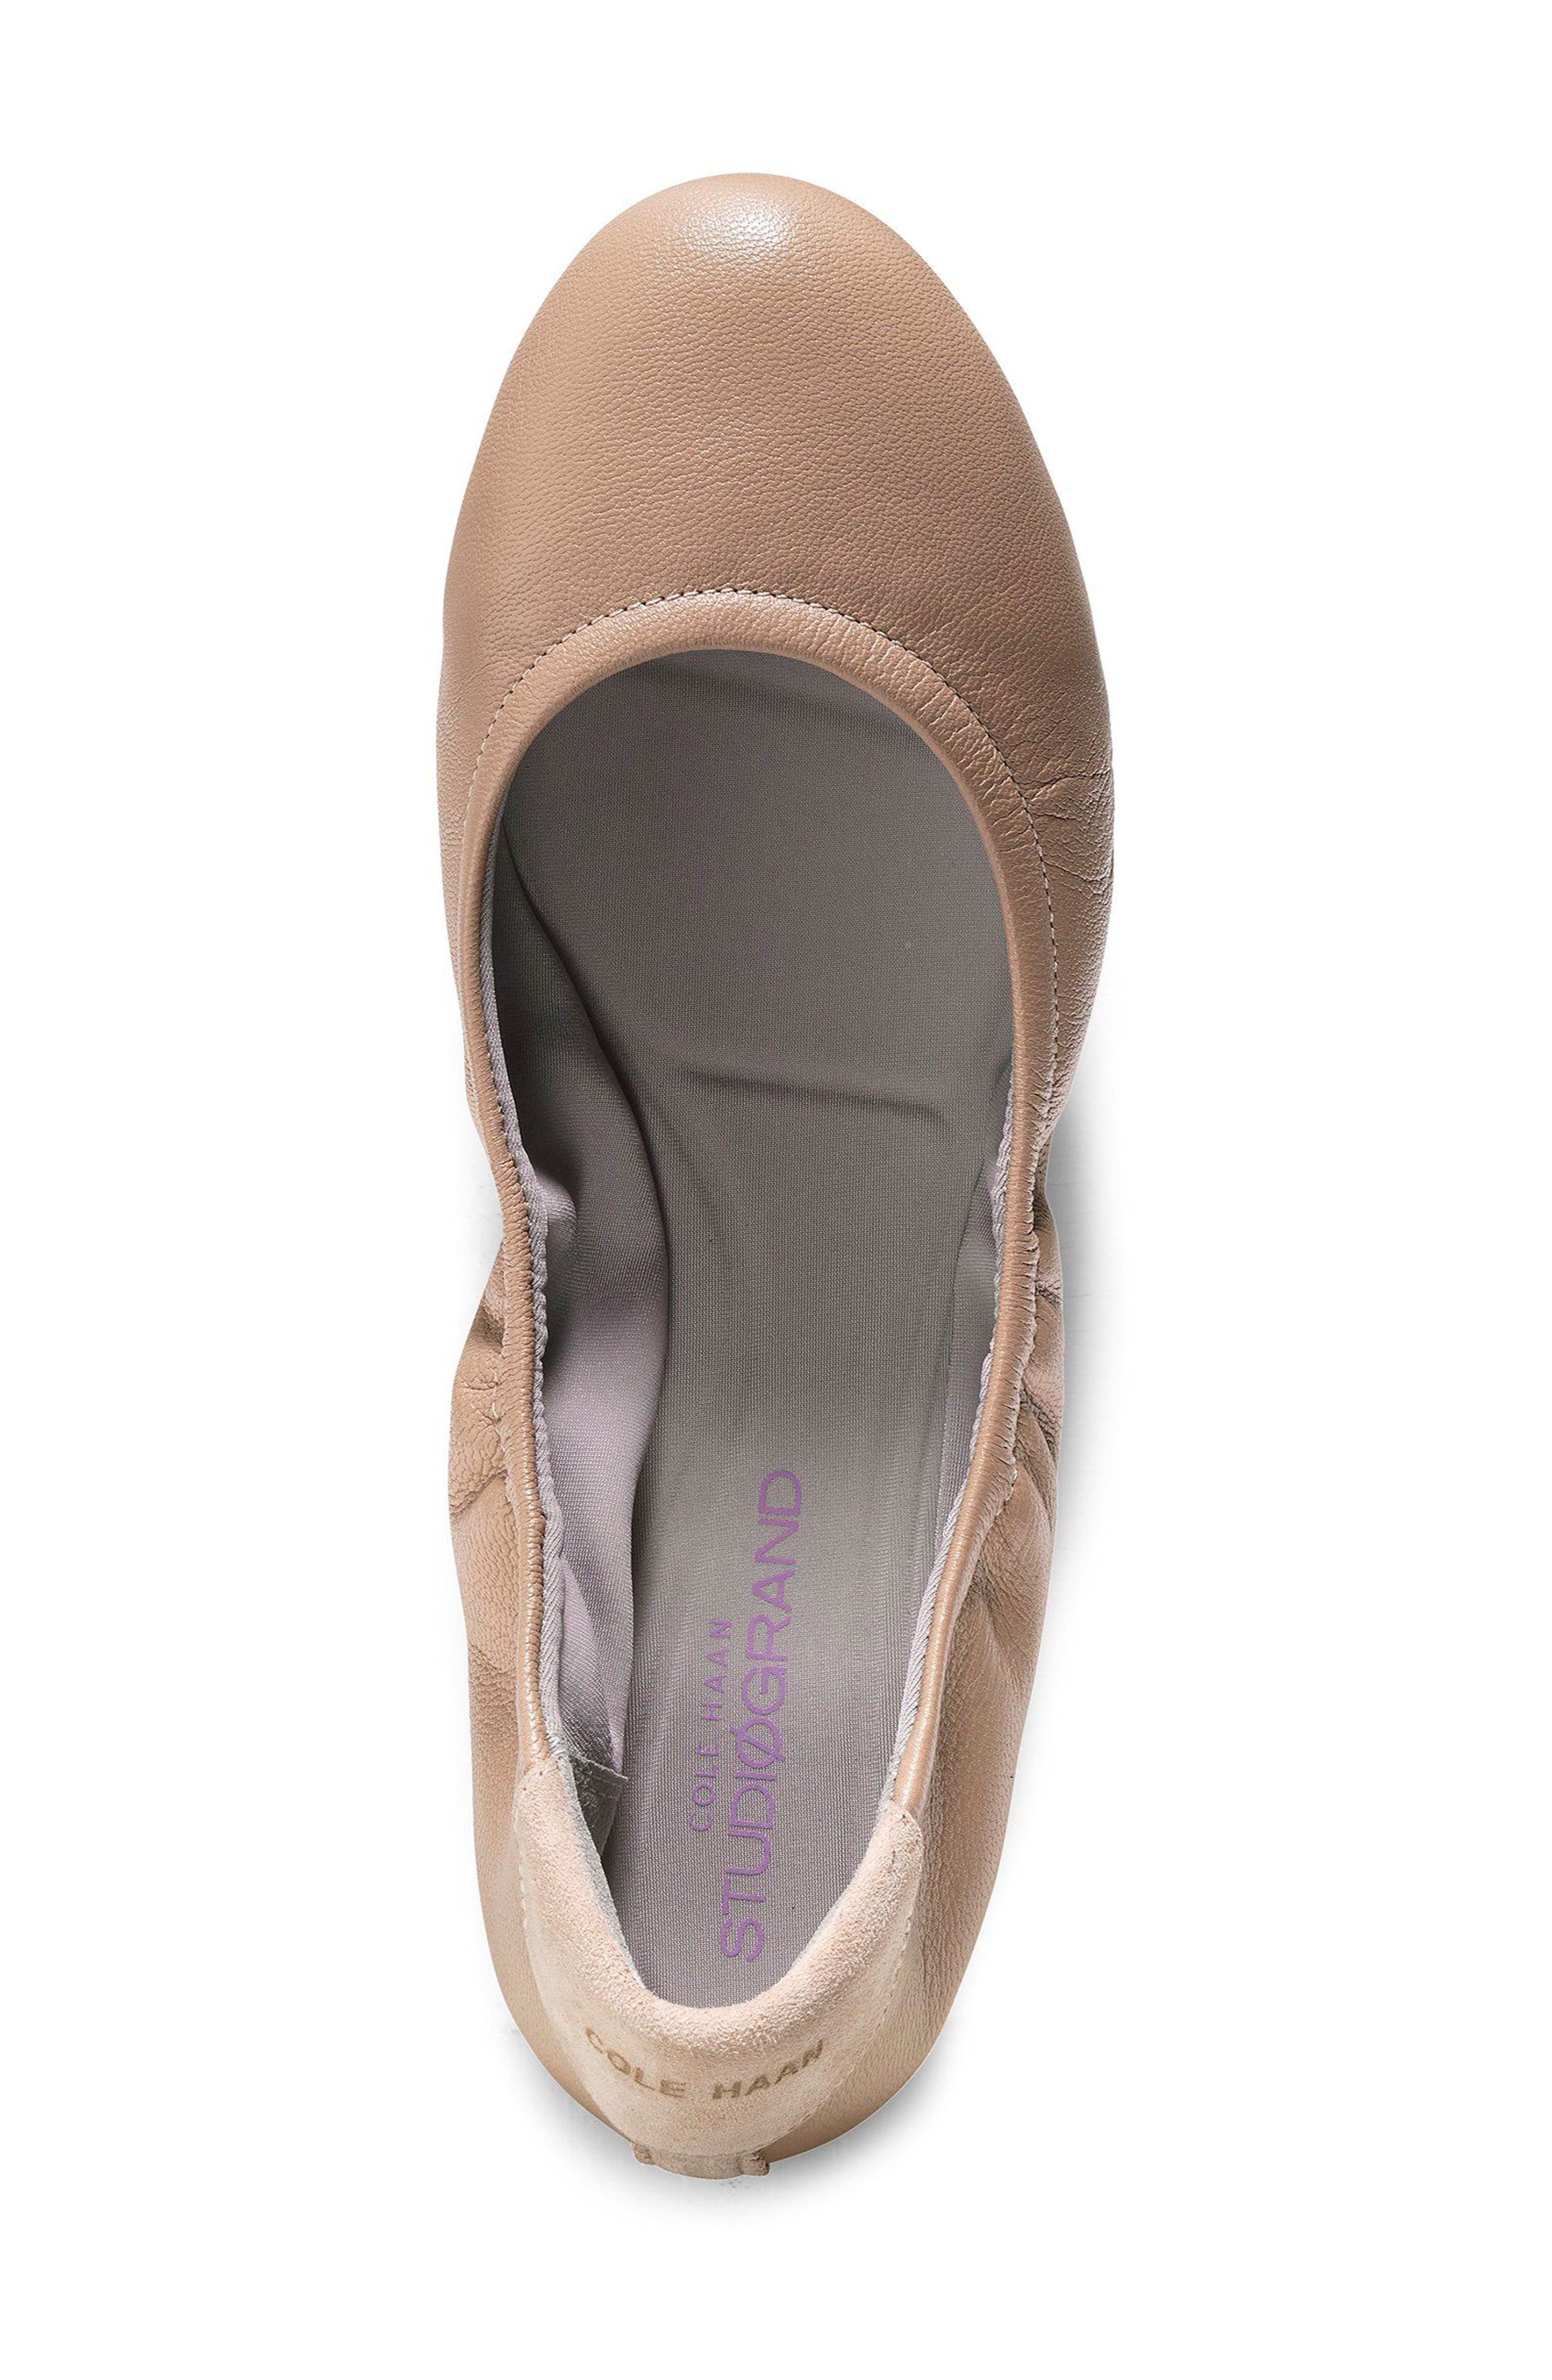 Studiogrand Ballet Flat,                             Alternate thumbnail 4, color,                             MAPLE SUGAR LEATHER